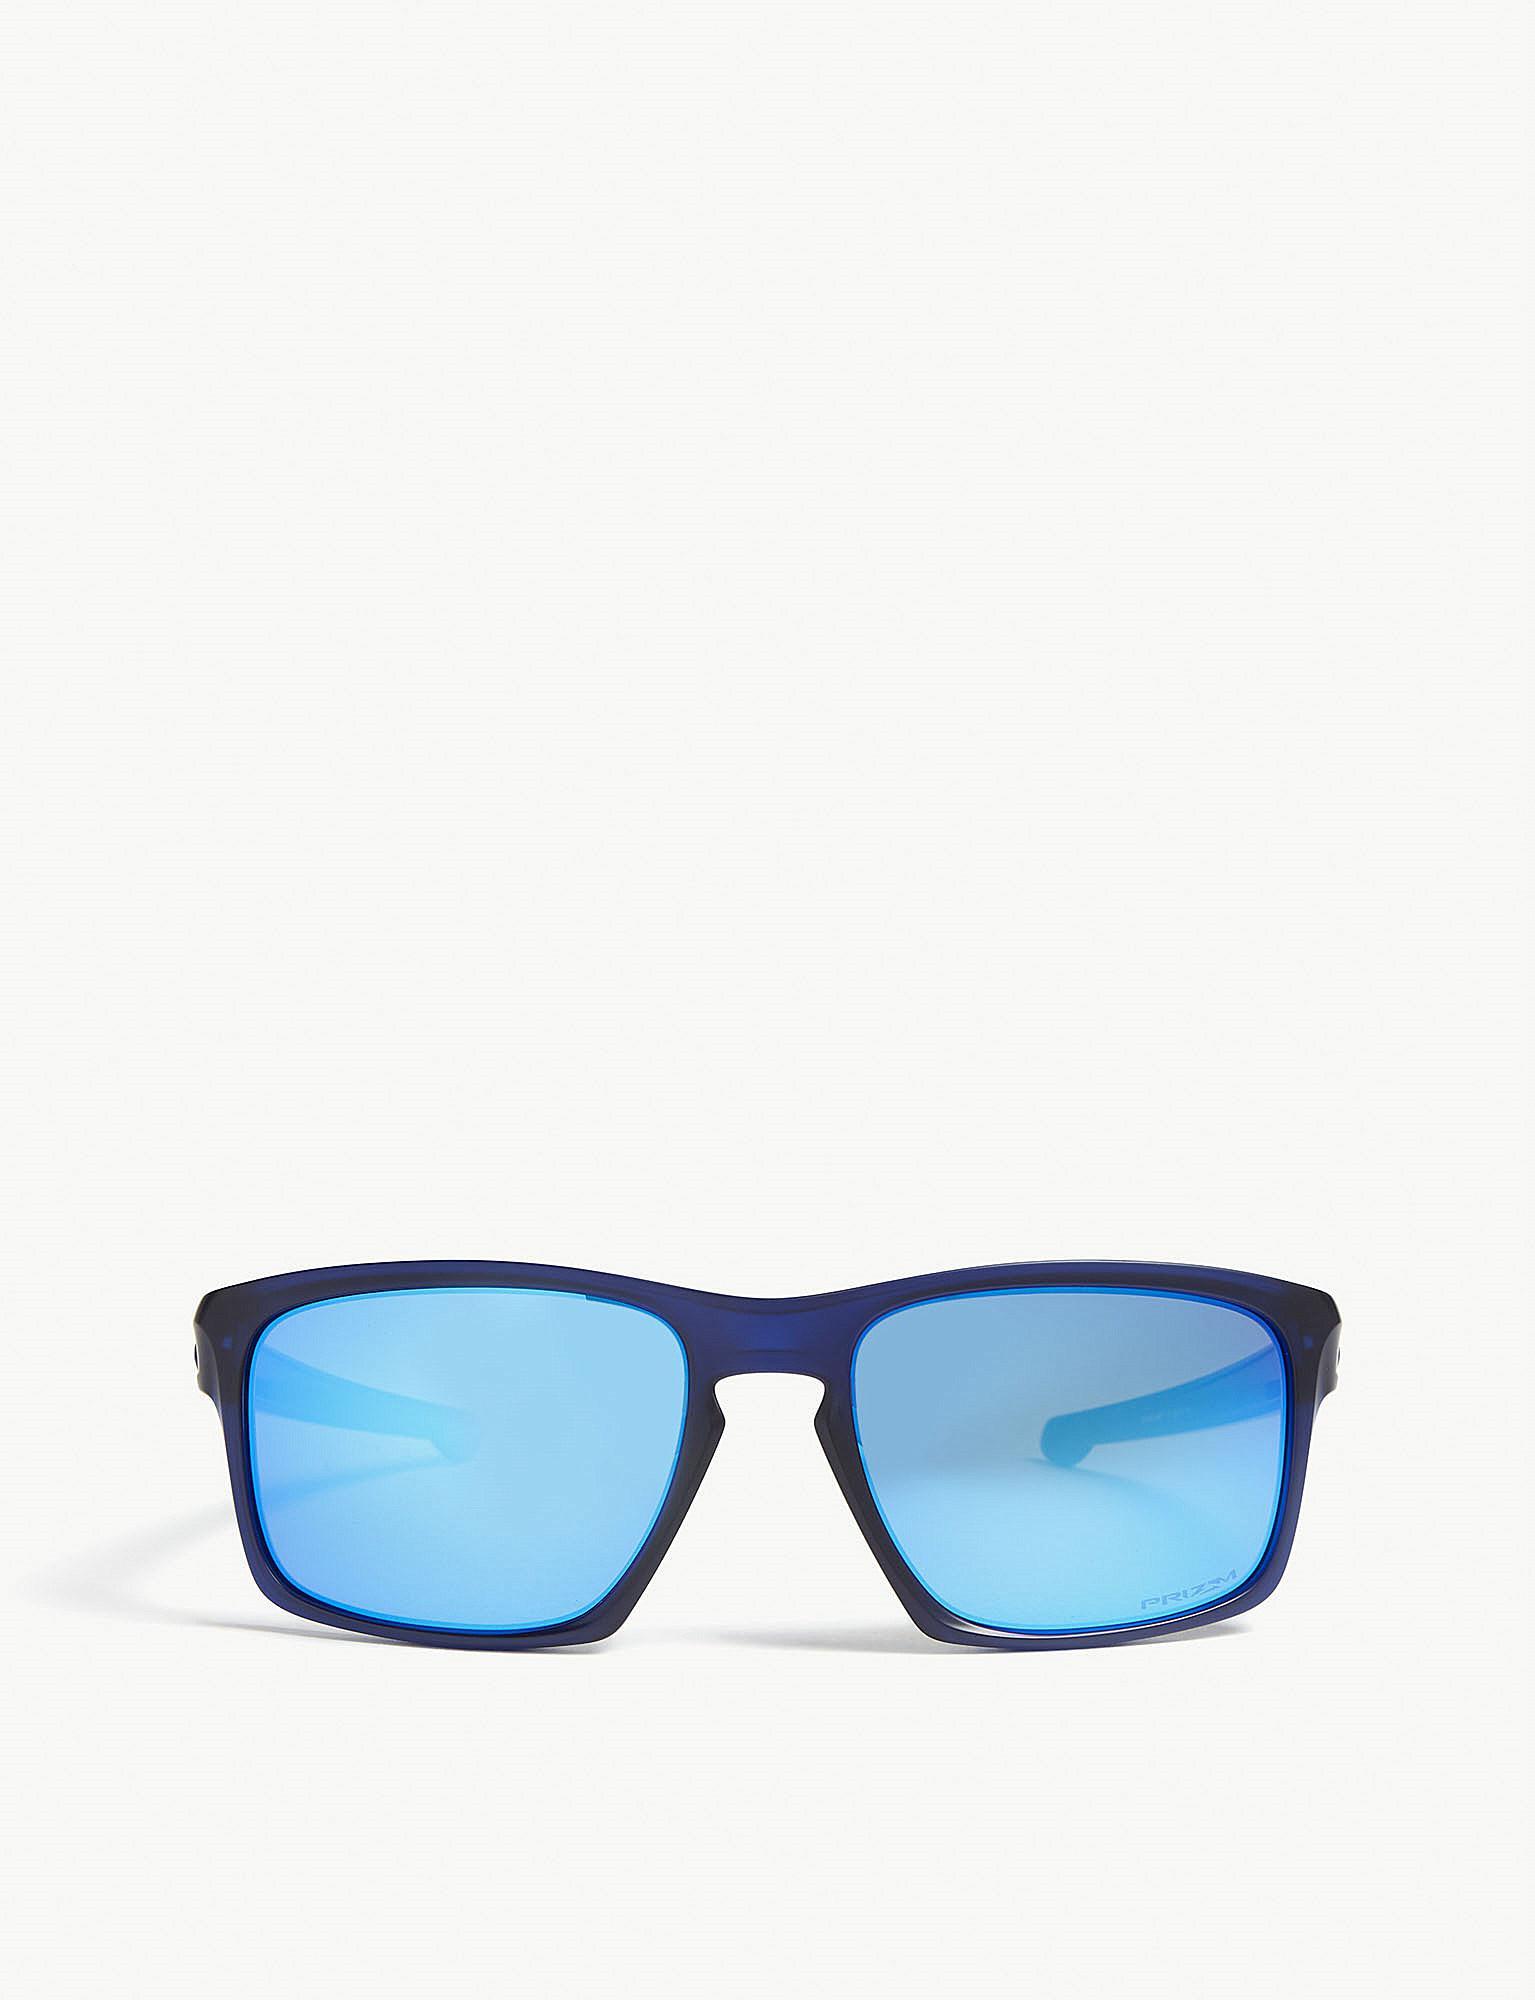 f54c51ac1946b Lyst - Oakley Sliver Rectangle-frame Sunglasses in Blue for Men